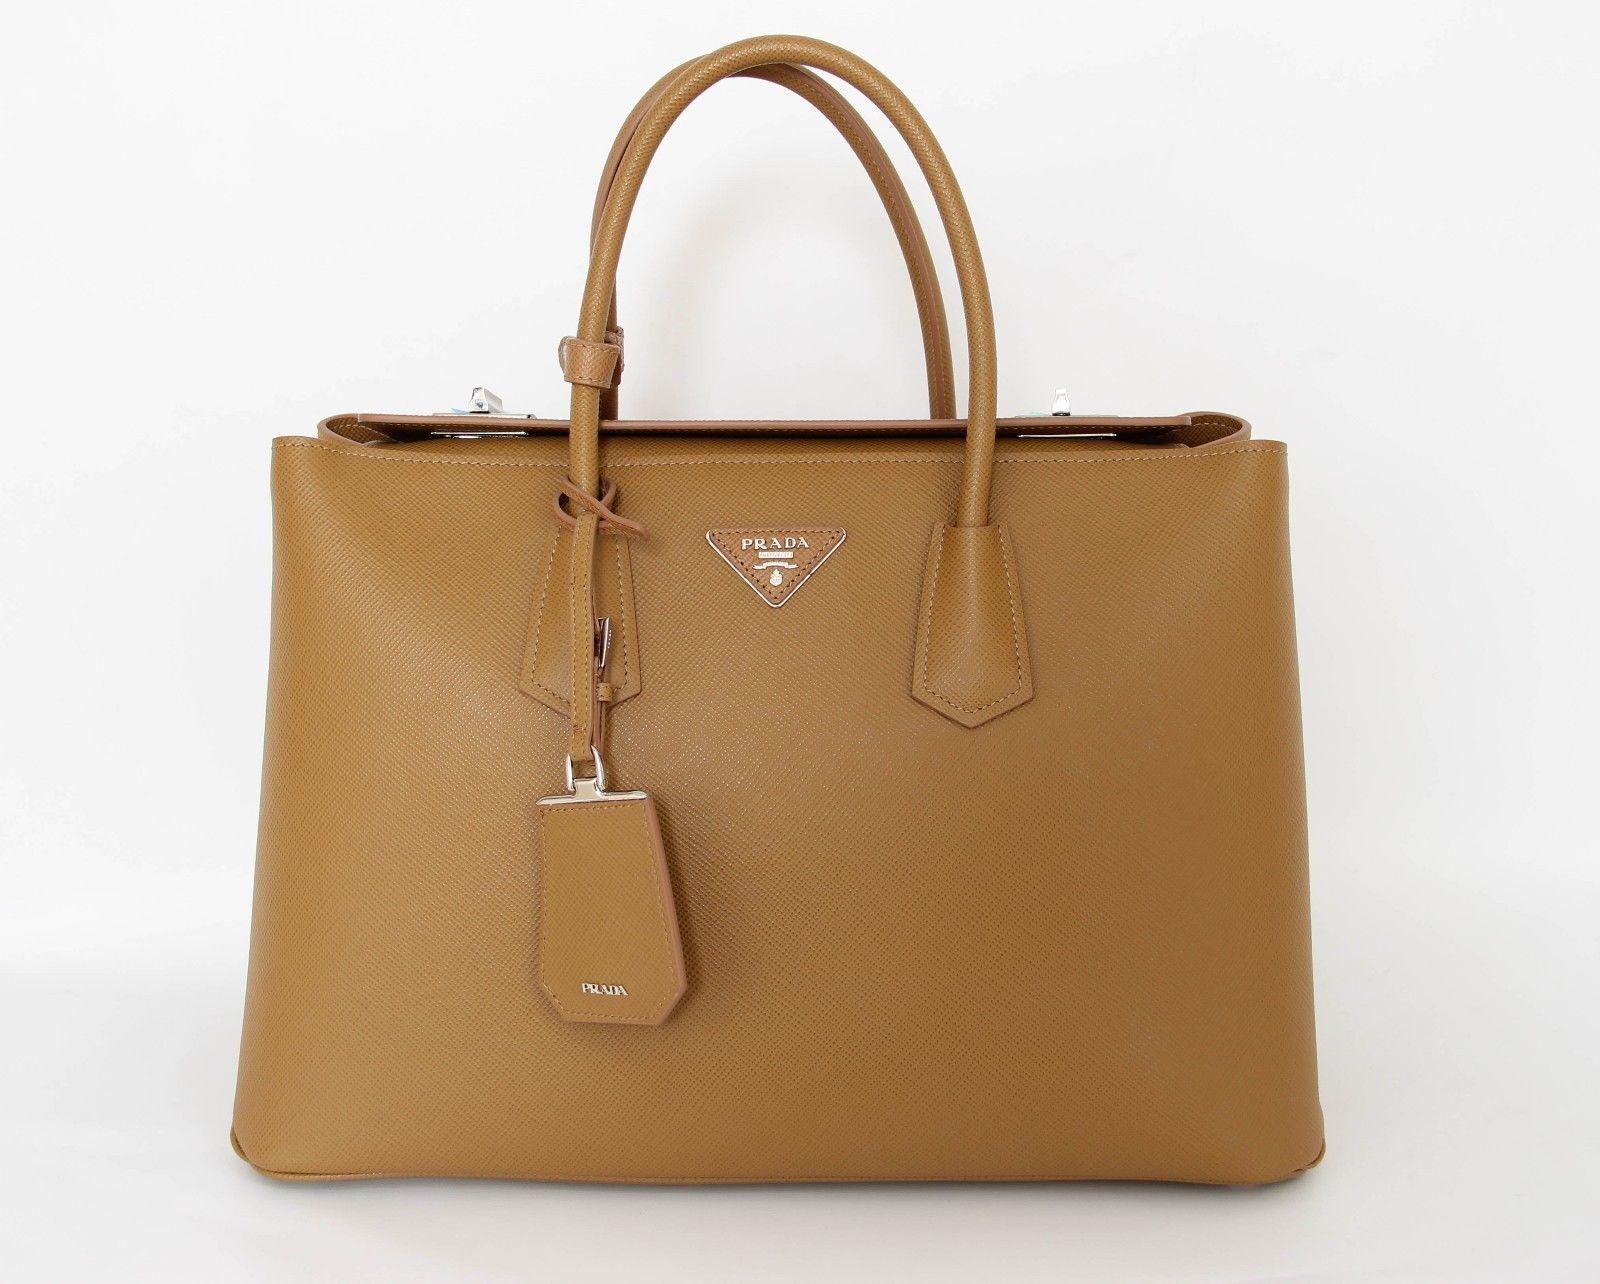 51585c4c45ff Designer Bags Top Ten Women Must Have | Stanford Center for ...